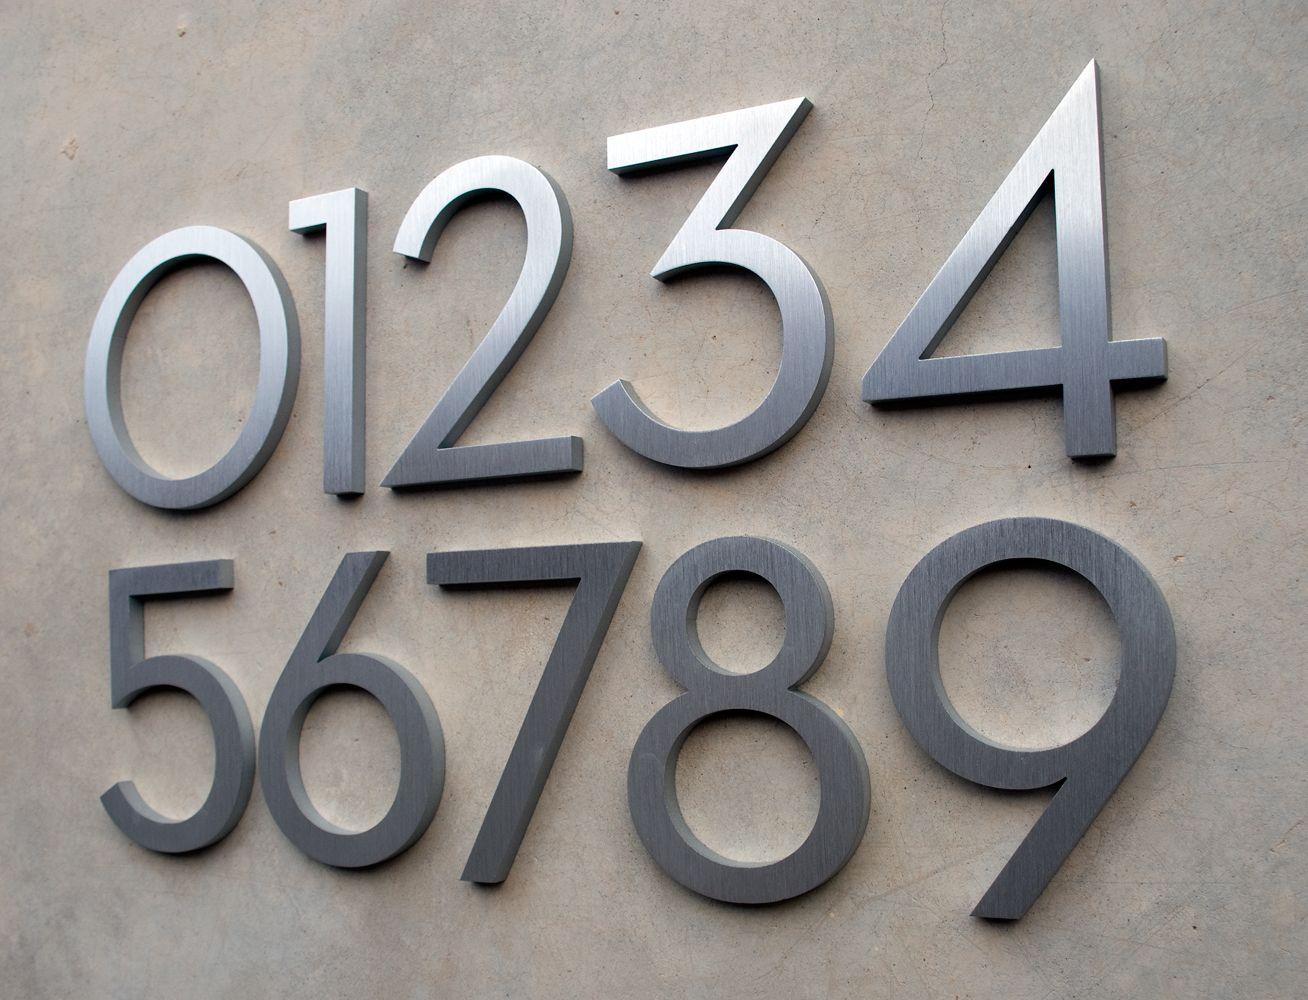 1000+ images about address.signage.details on Pinterest Mid ... - ^